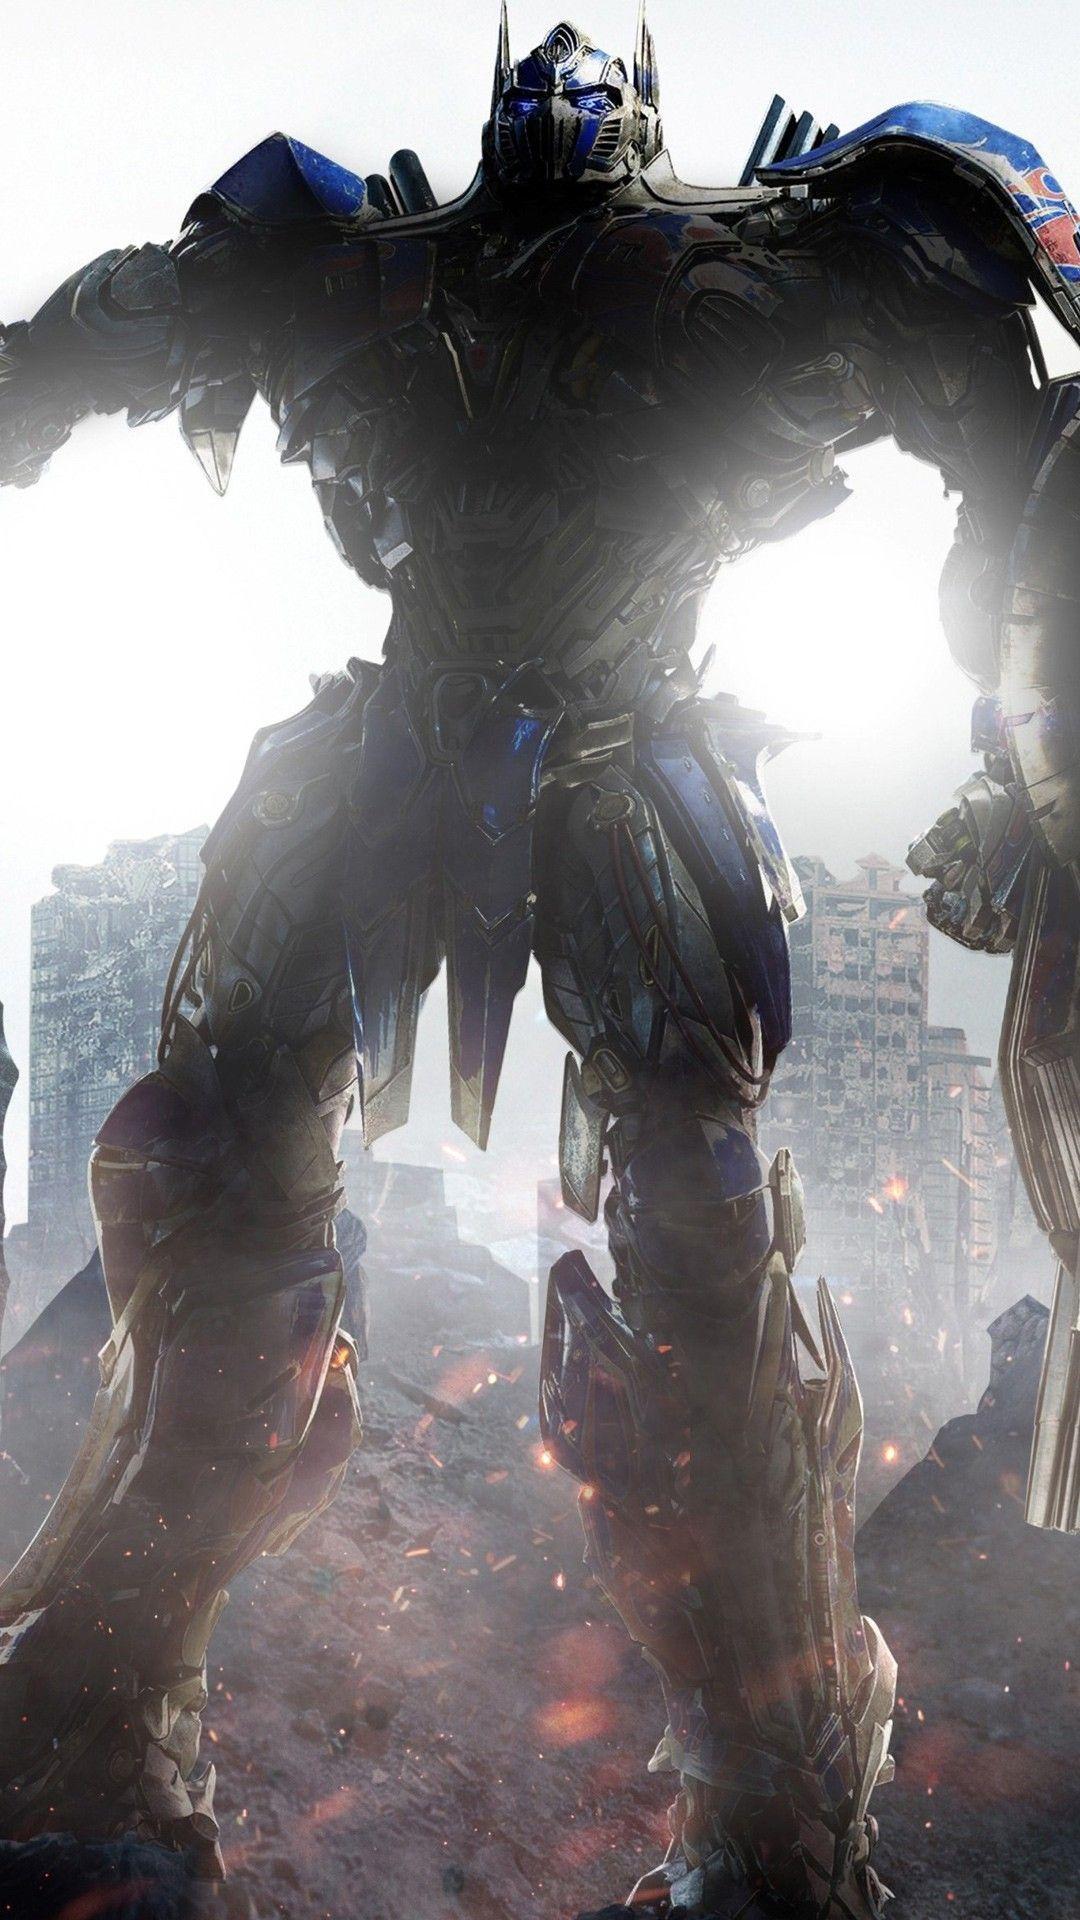 Transformers Optimus Prime Iphone Wallpapers Top Free